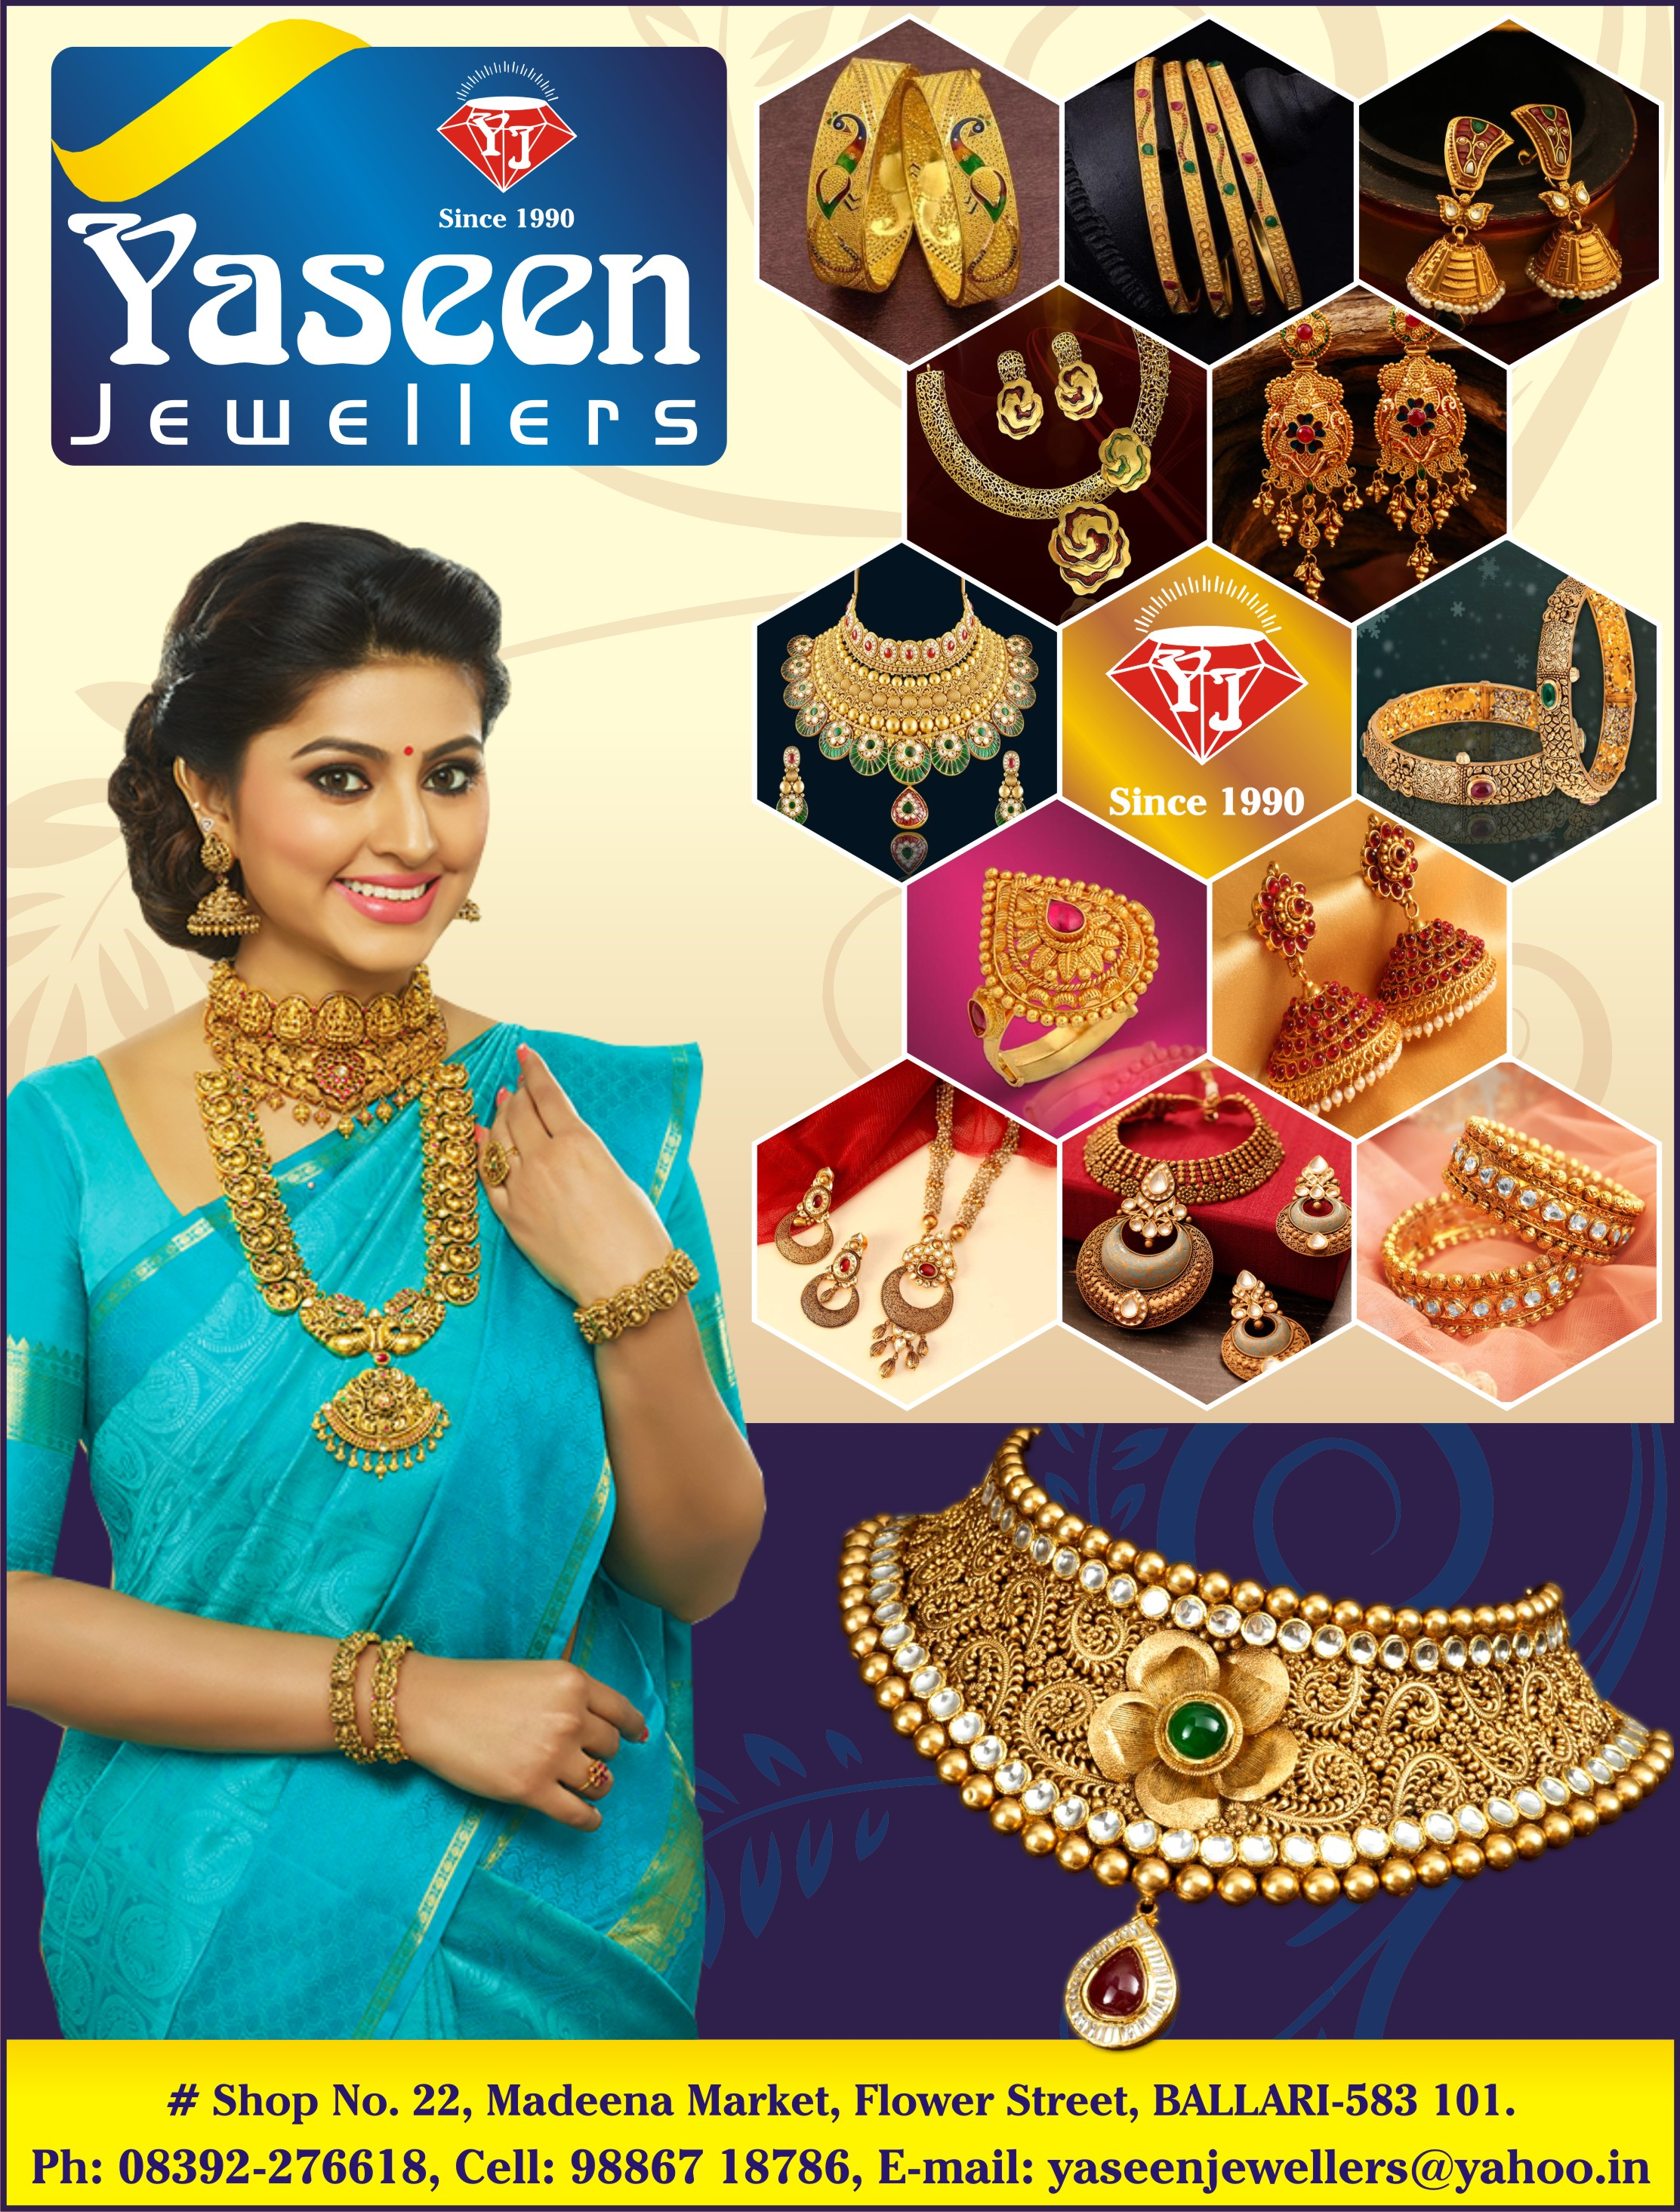 Yaseen Jewellers